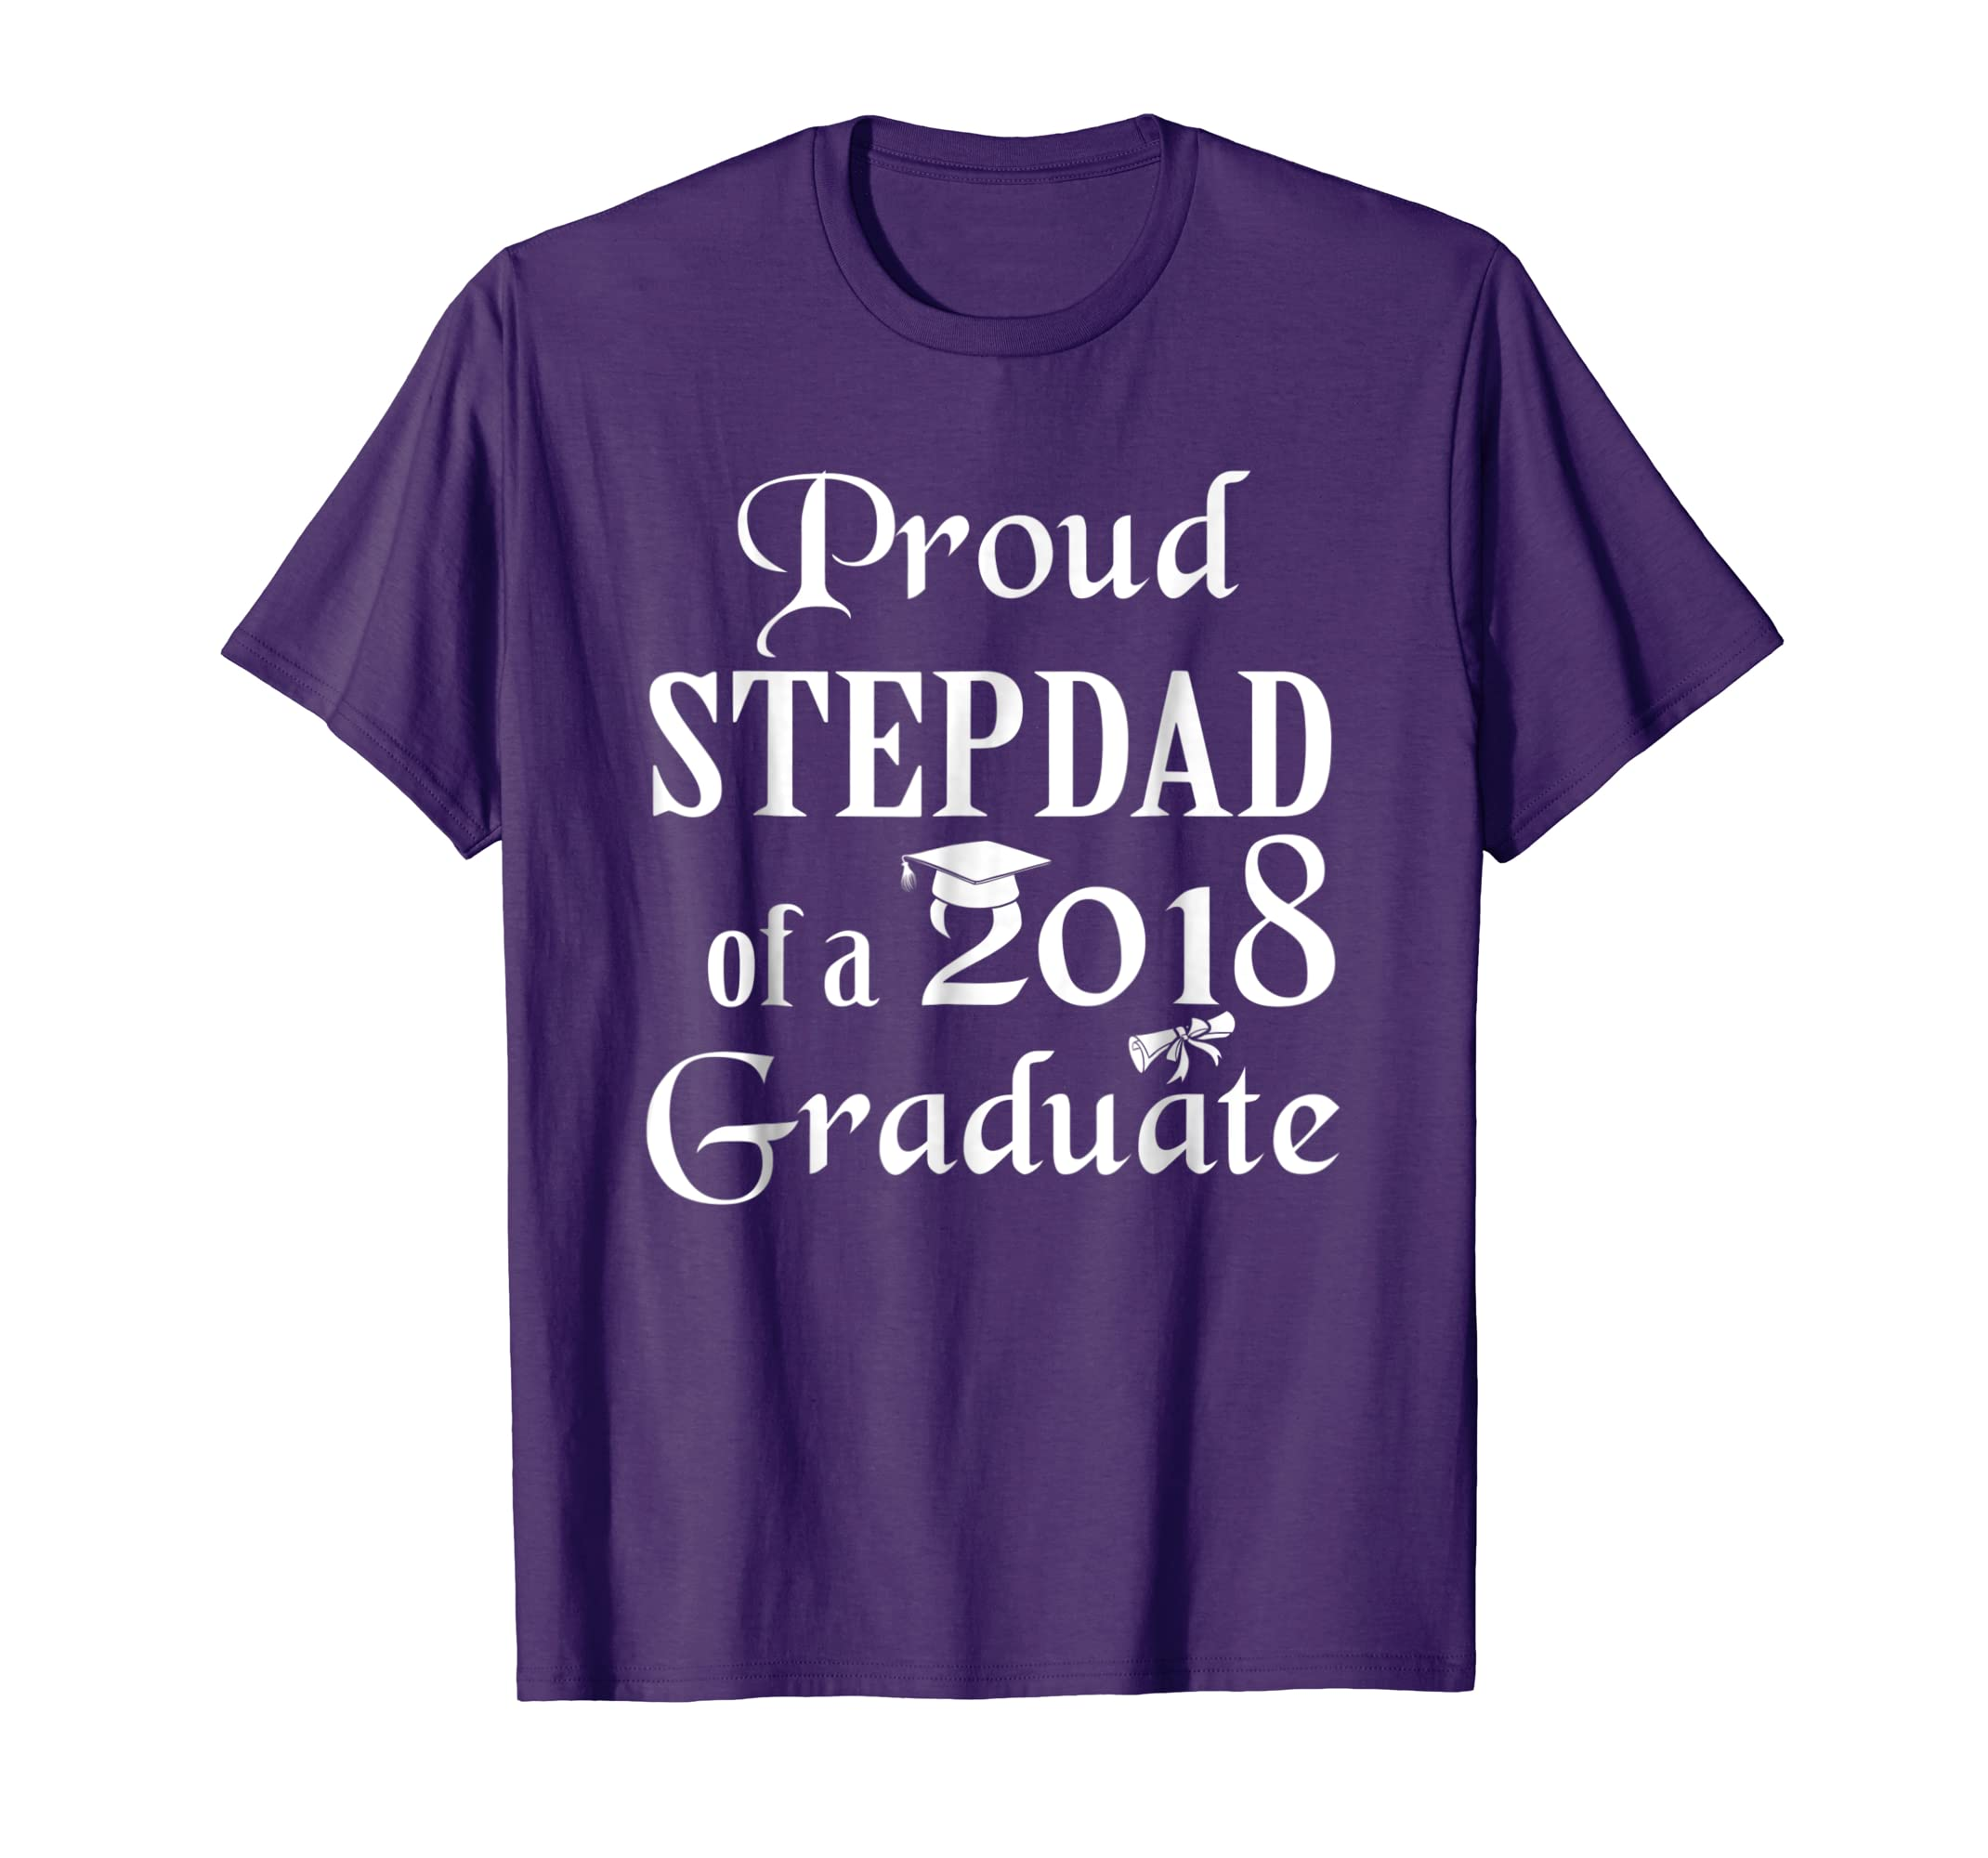 proud stepdad of a 2018 graduate shirt cool graduation gifts anz